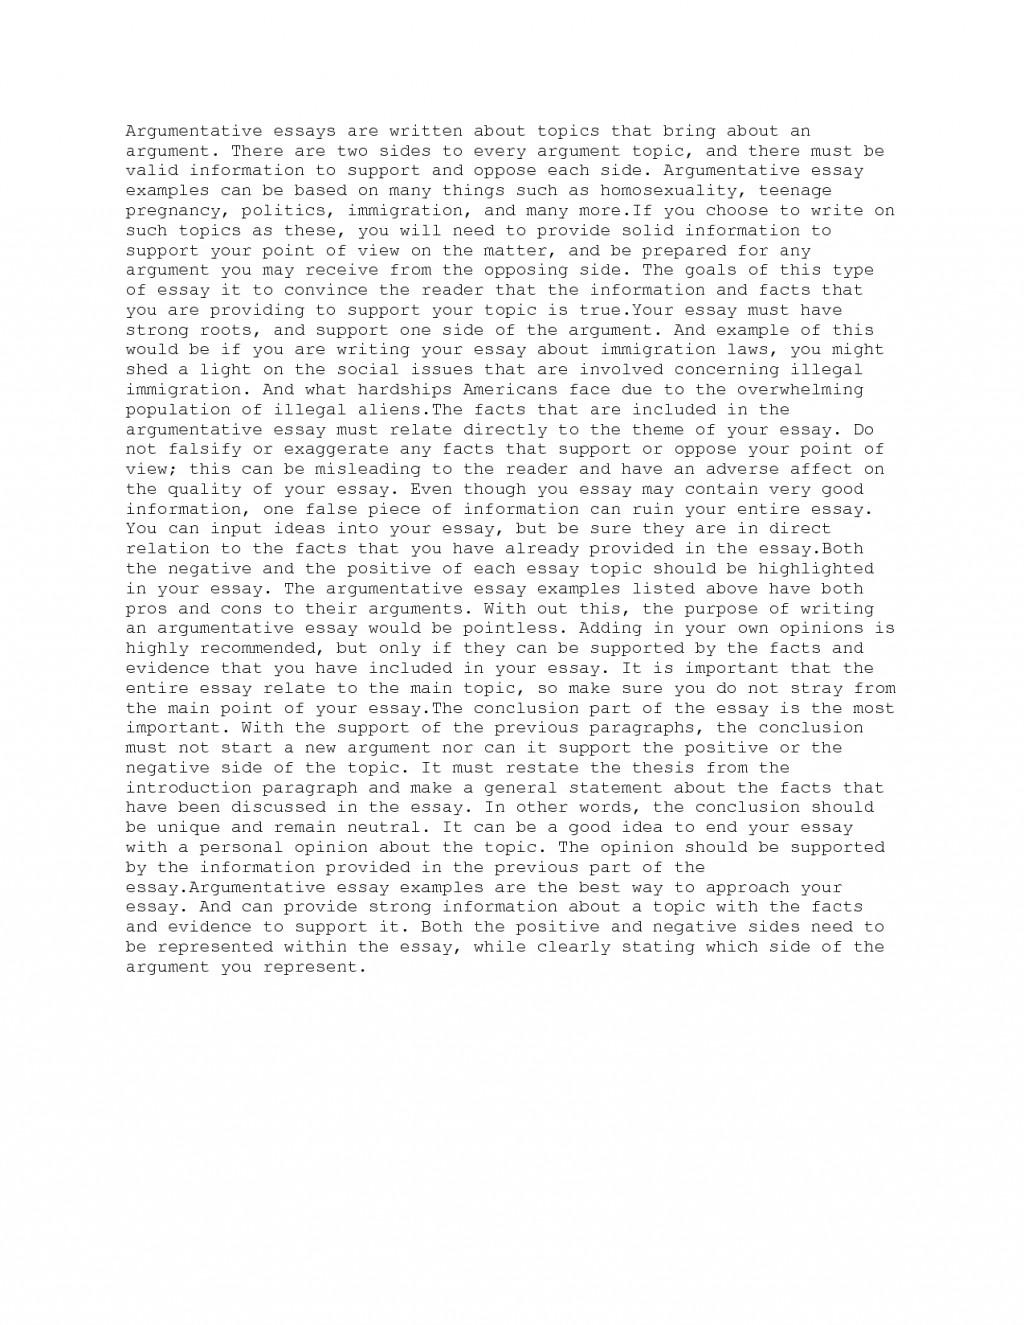 022 Qv3jjq5wkt Best Persuasive Essay Topics Beautiful Uk Argumentative For College Large